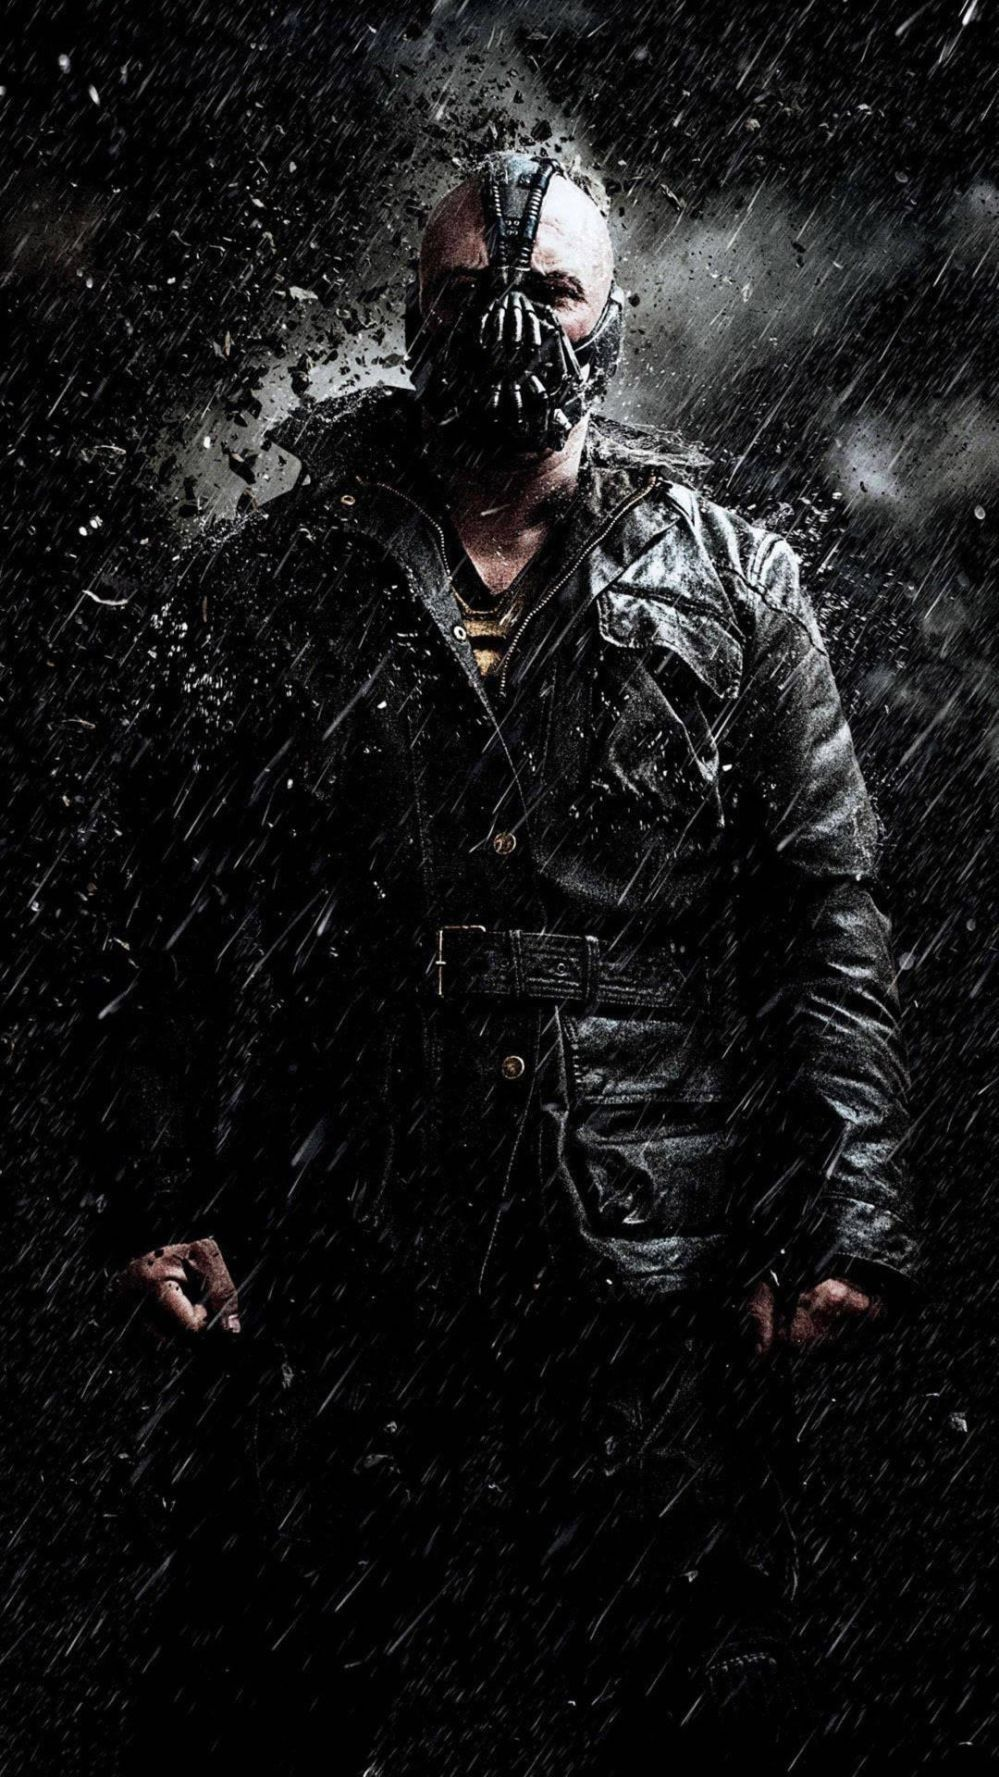 Bane 14 Bane Dark Knight Batman Arkham Knight Scarecrow Dark